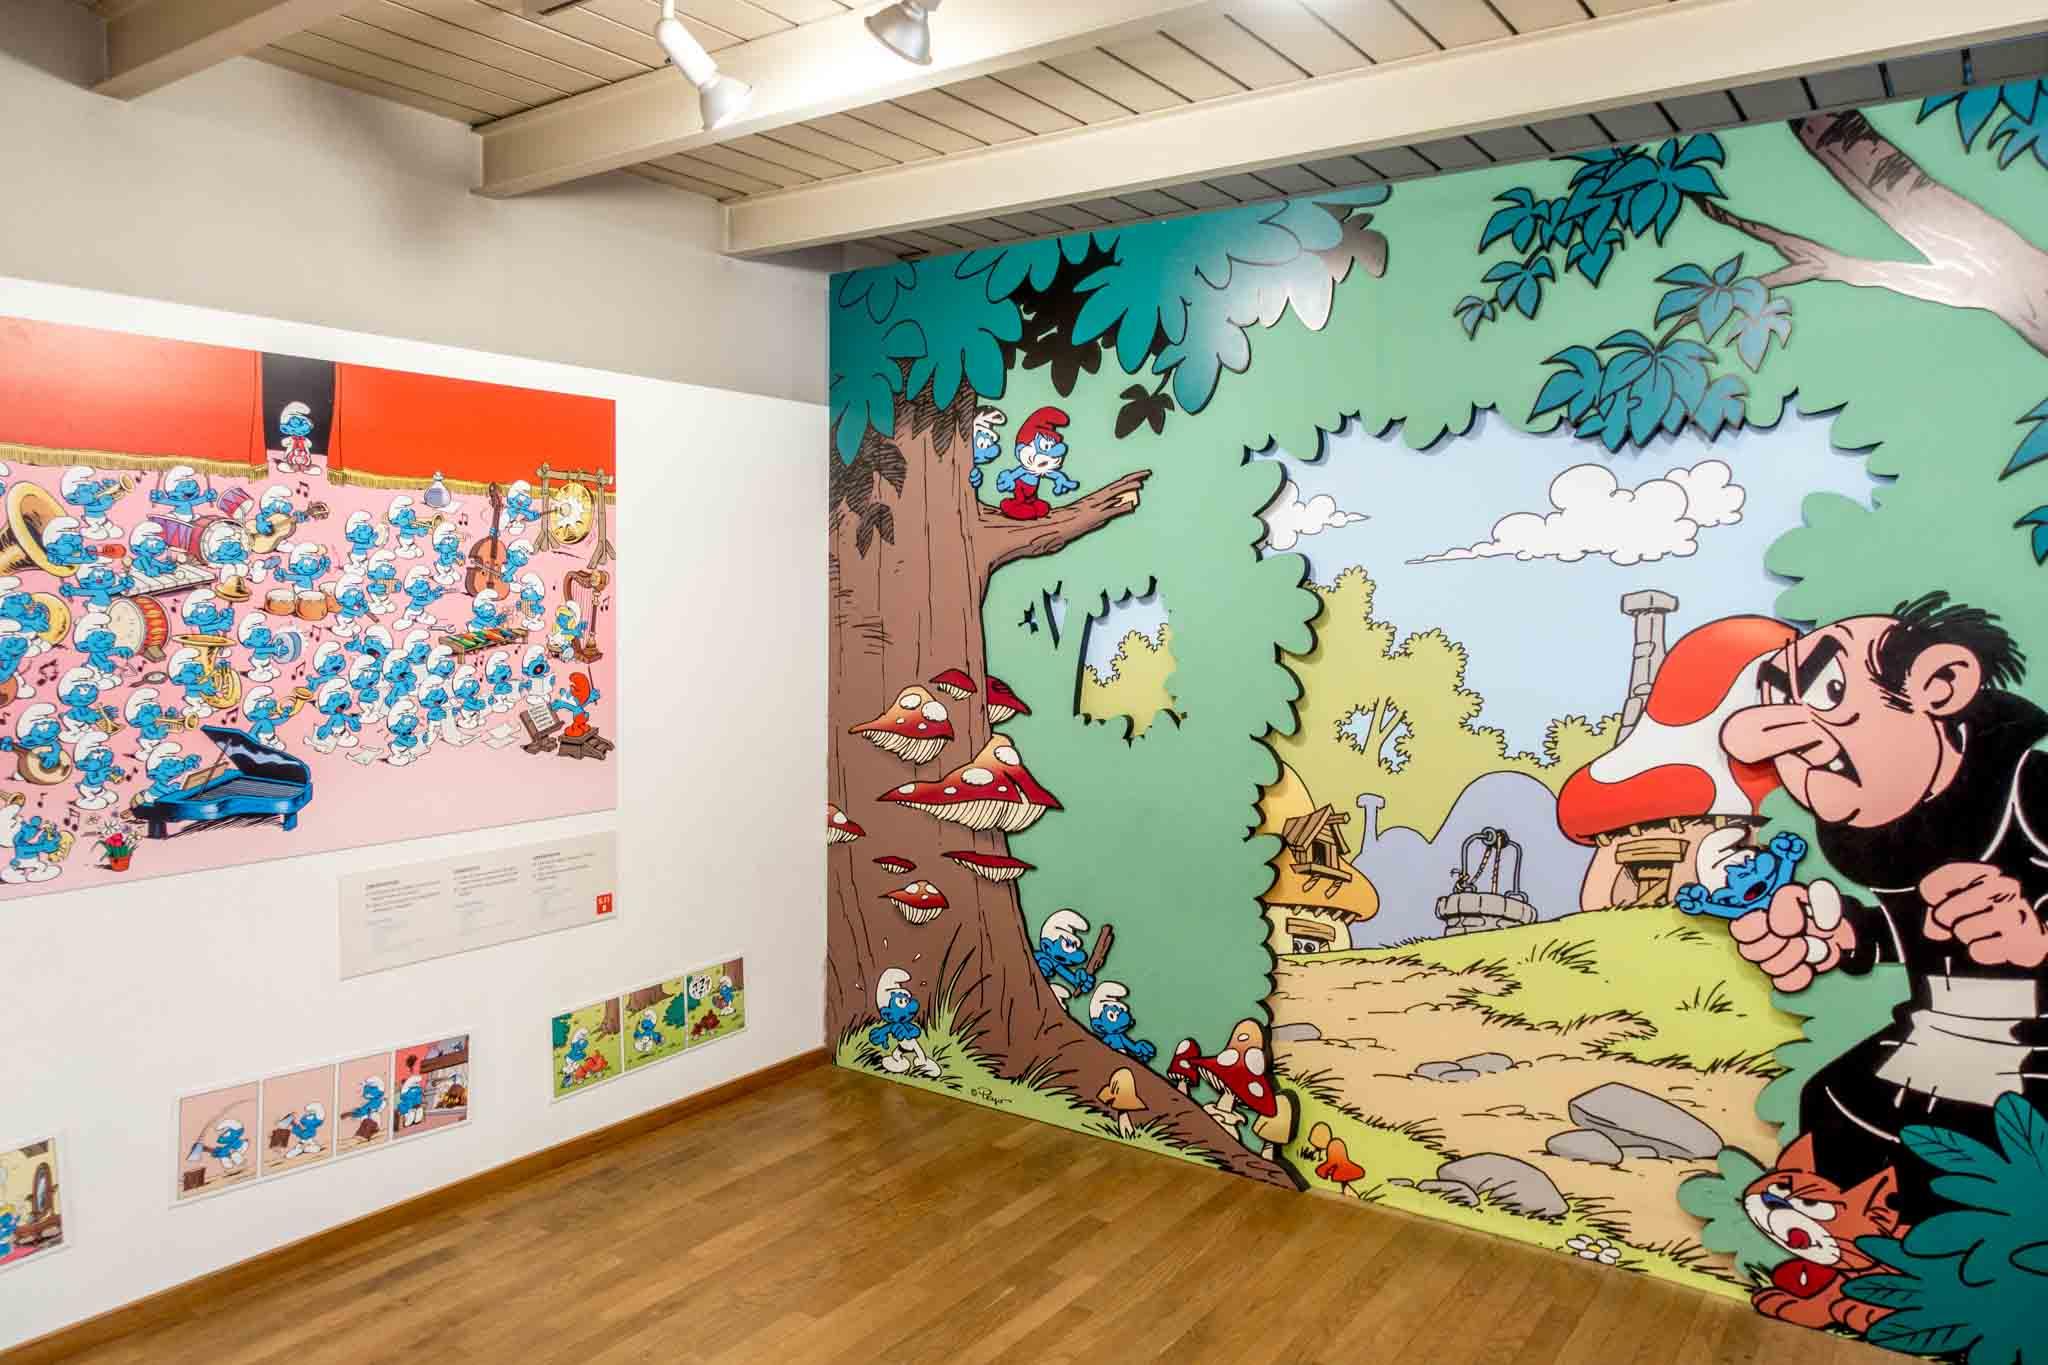 Cartoons drawings displayed in a museum